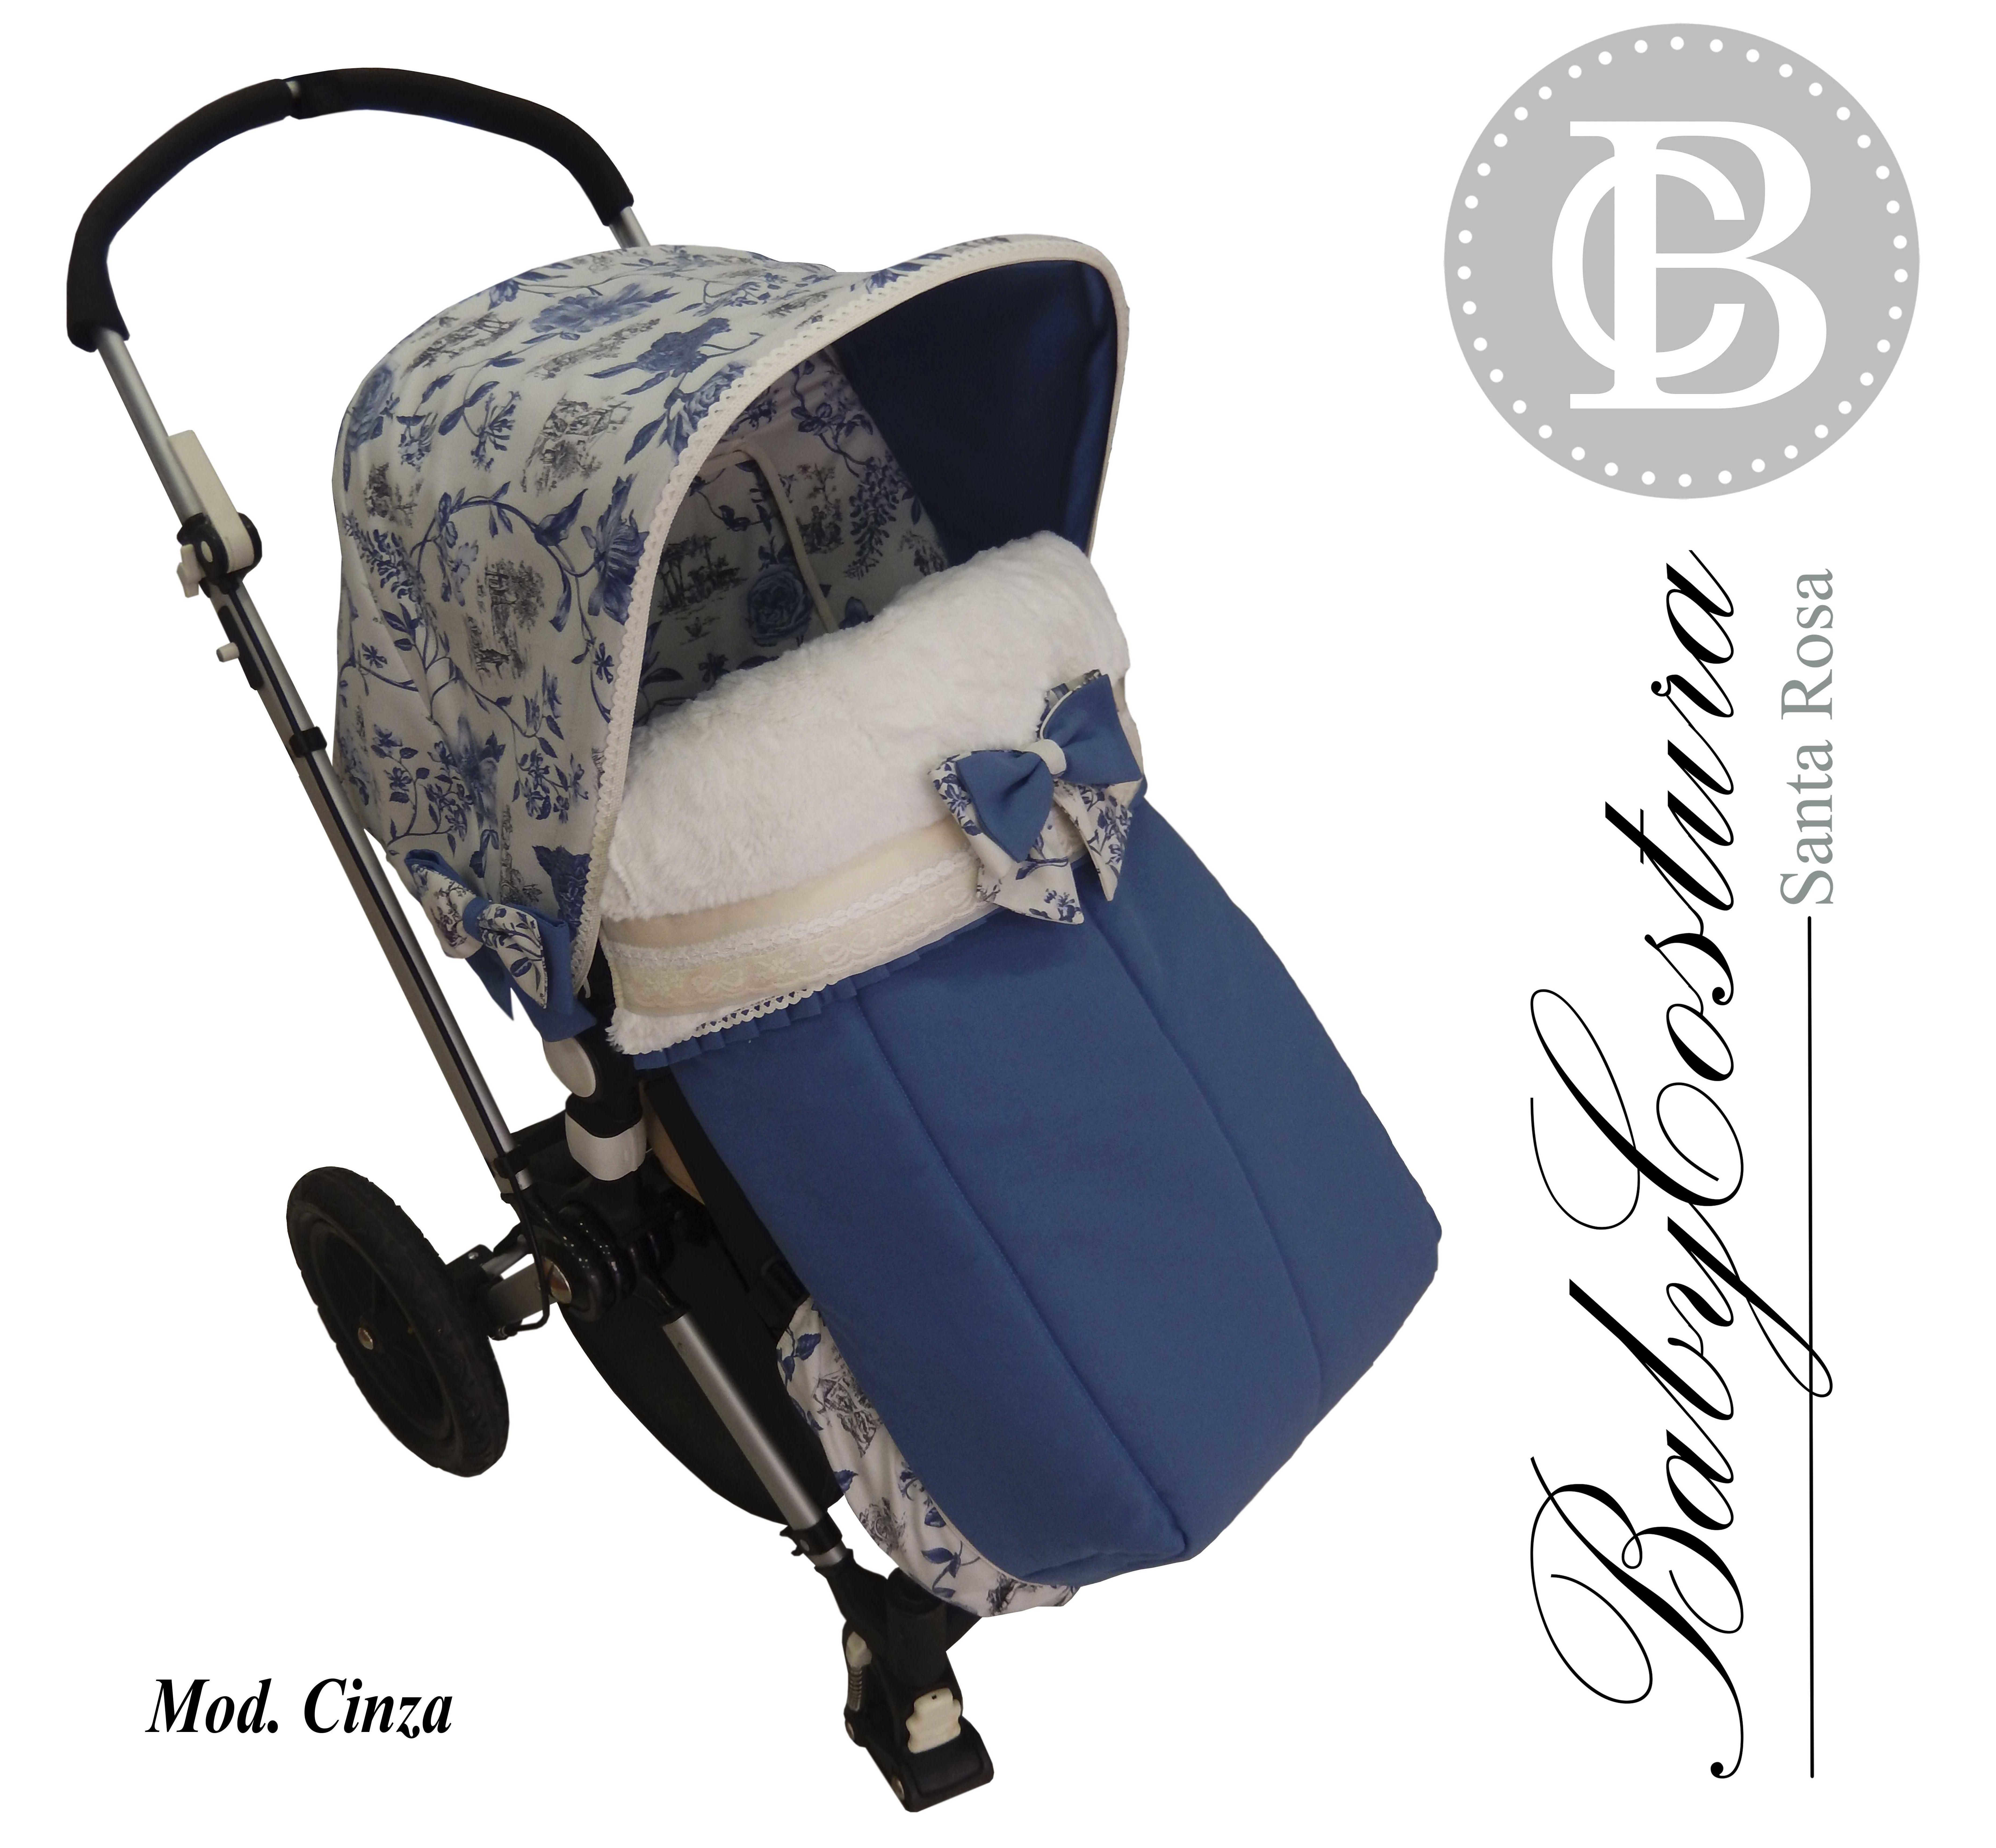 Saco silla y capota personalizada para Bugaboo